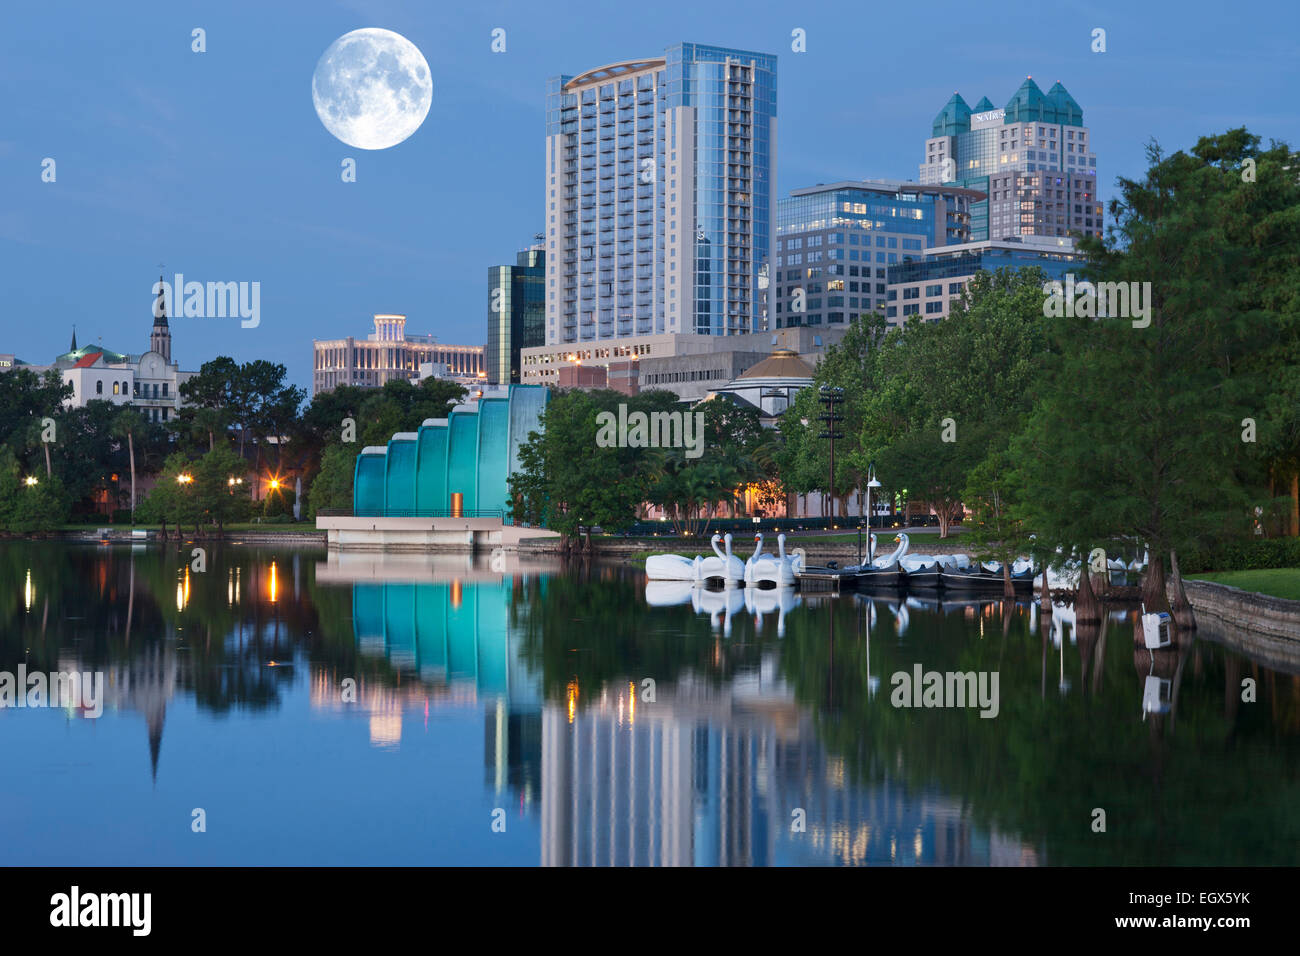 DOWNTOWN SKYLINE LAKE EOLA PARK ORLANDO FLORIDA USA - Stock Image